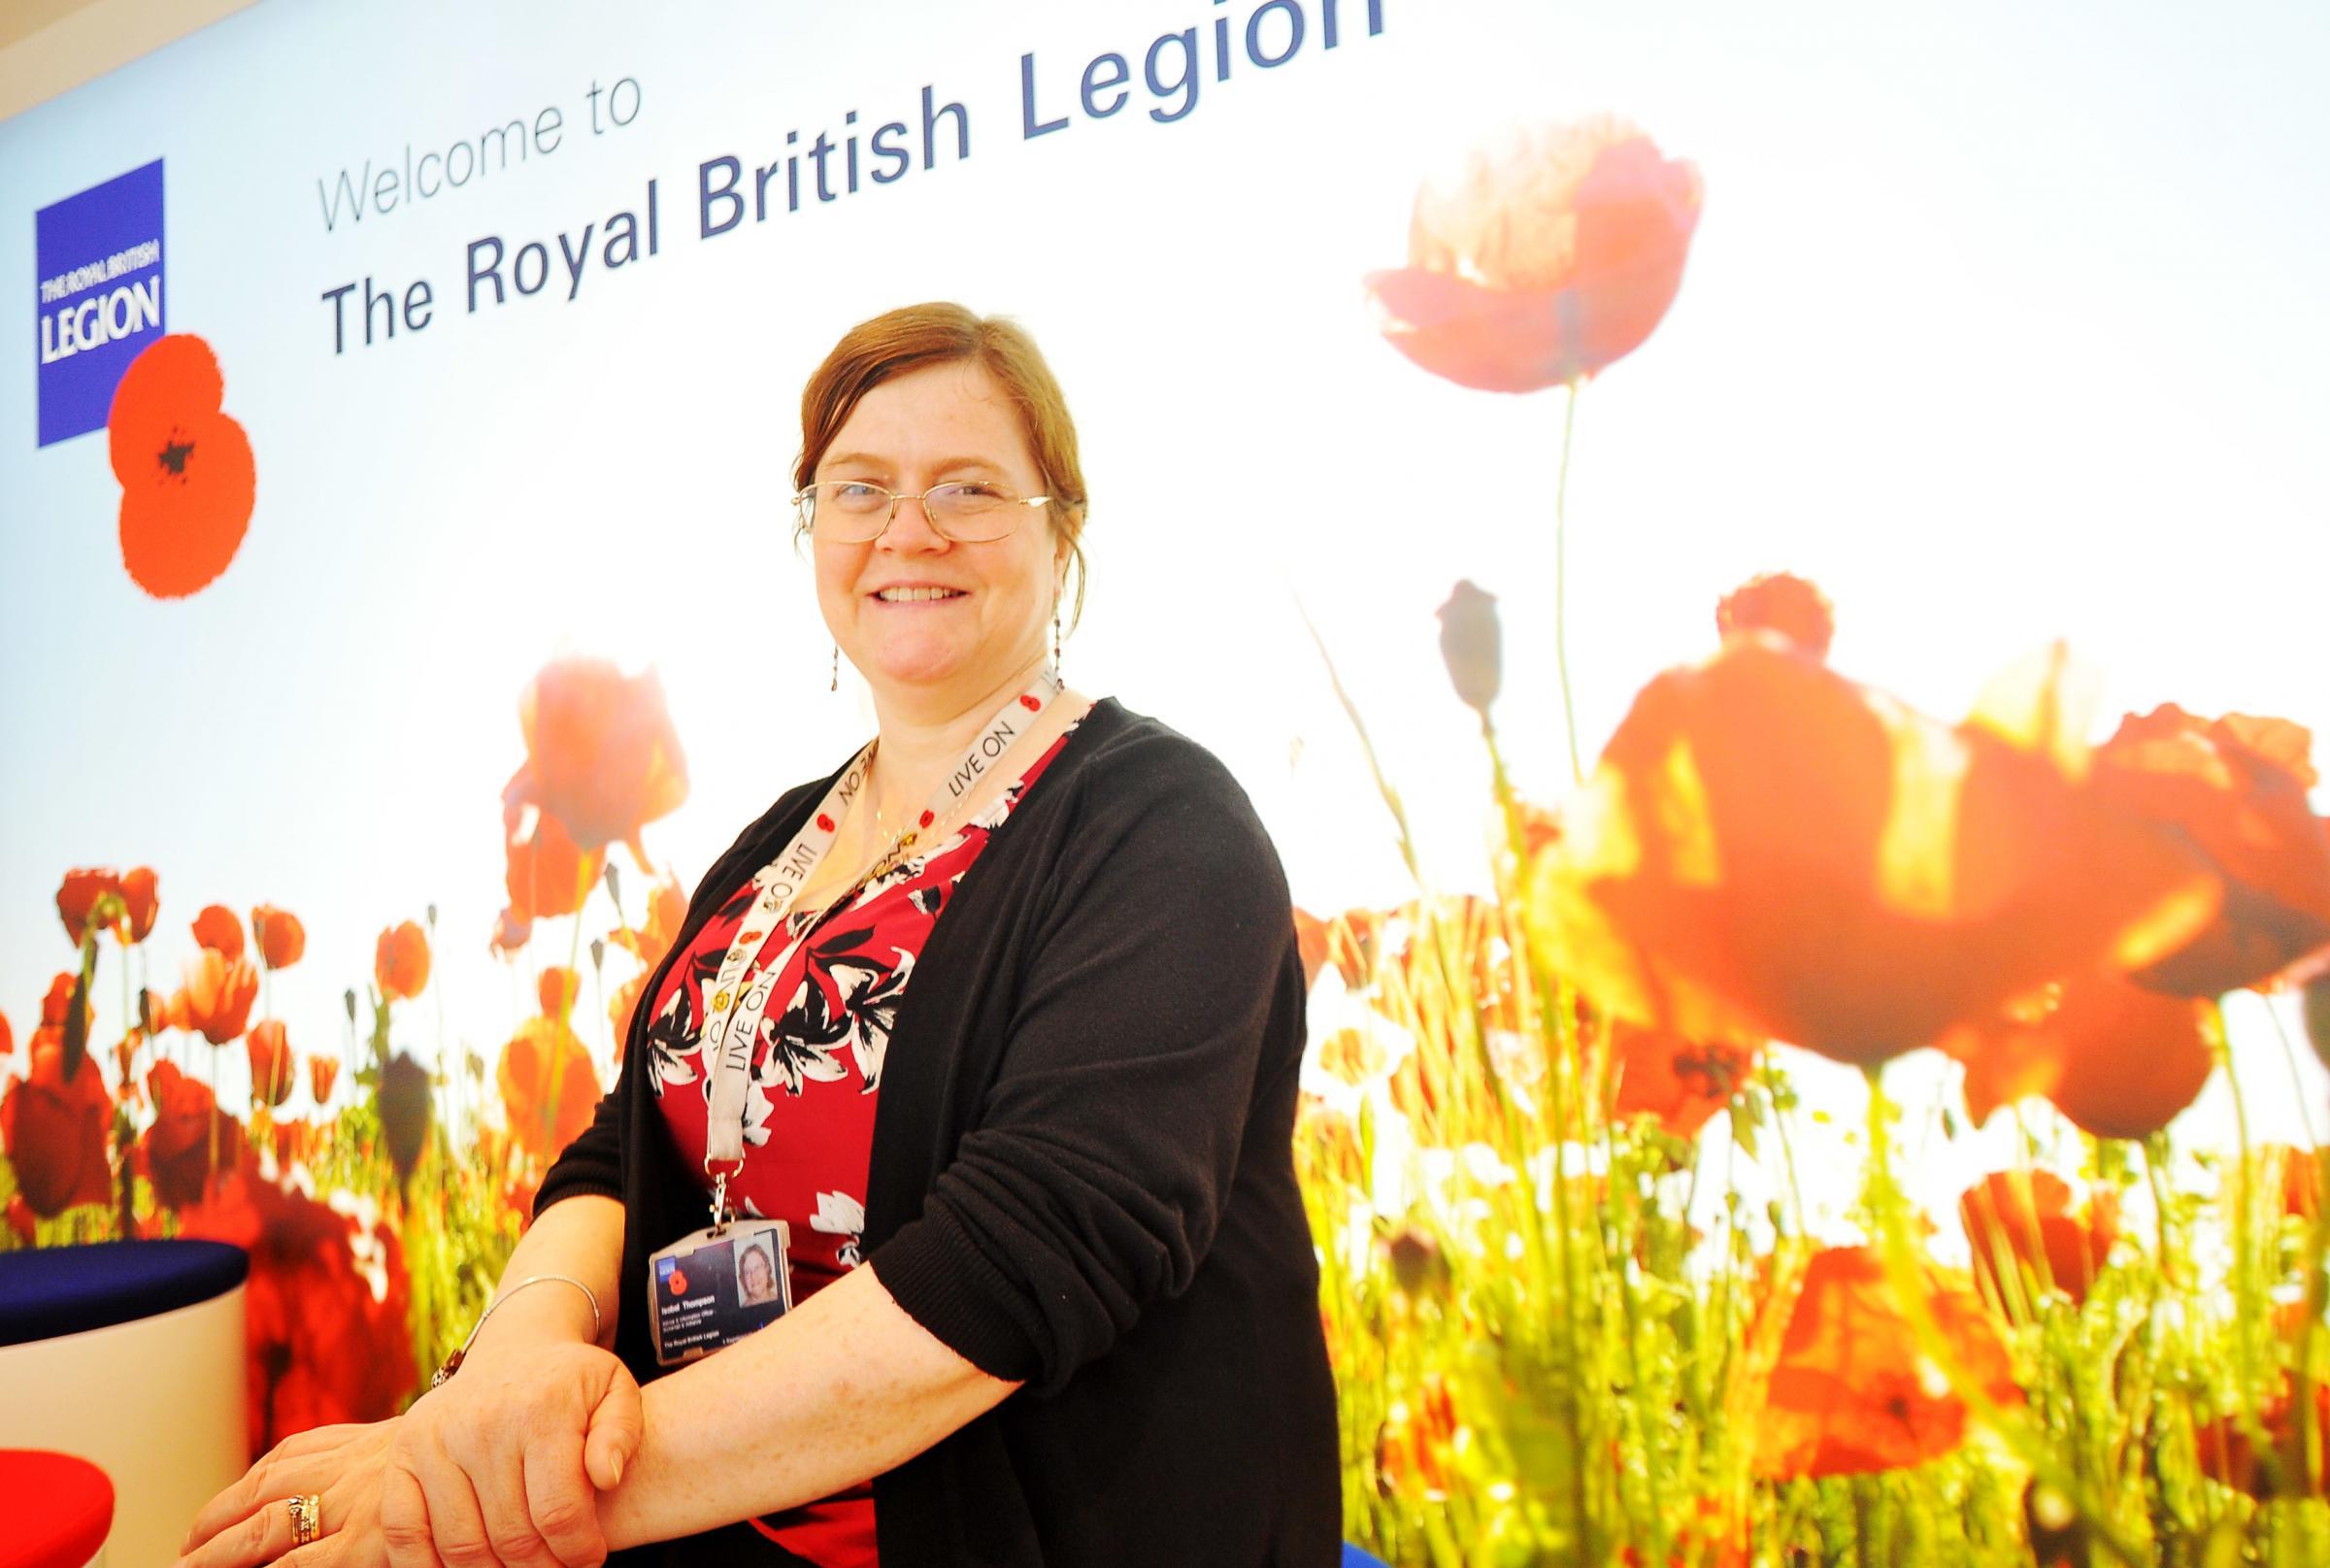 Display at Swindon Royal British Legion for D-Day landings anniversary